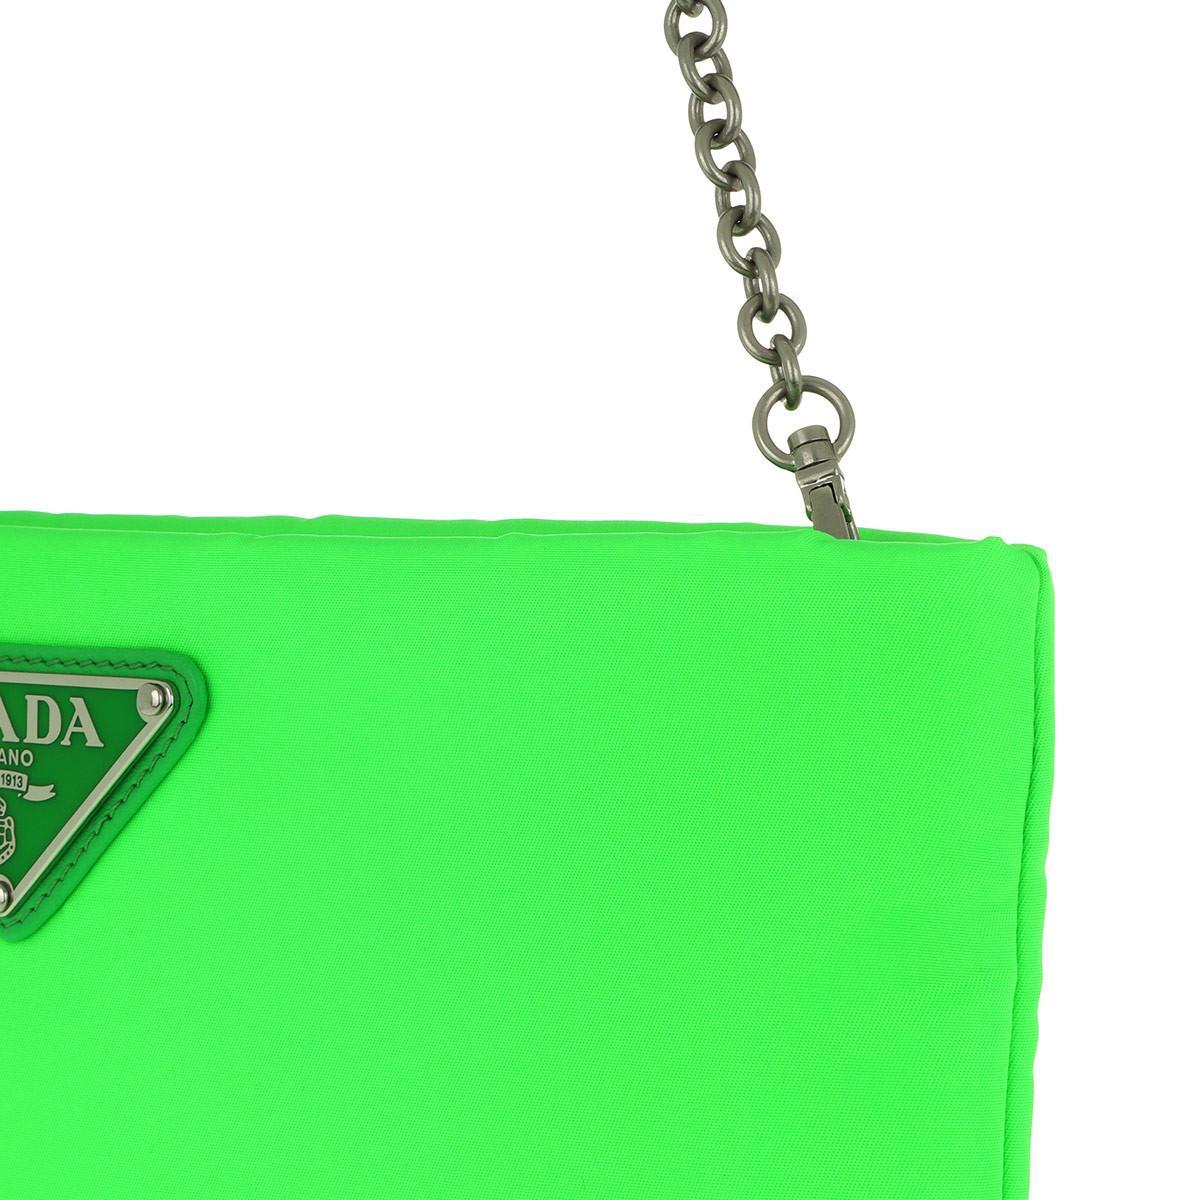 bc463dad6c33f2 Prada Clutch Padded Nylon 2 Neon Green in Green - Lyst